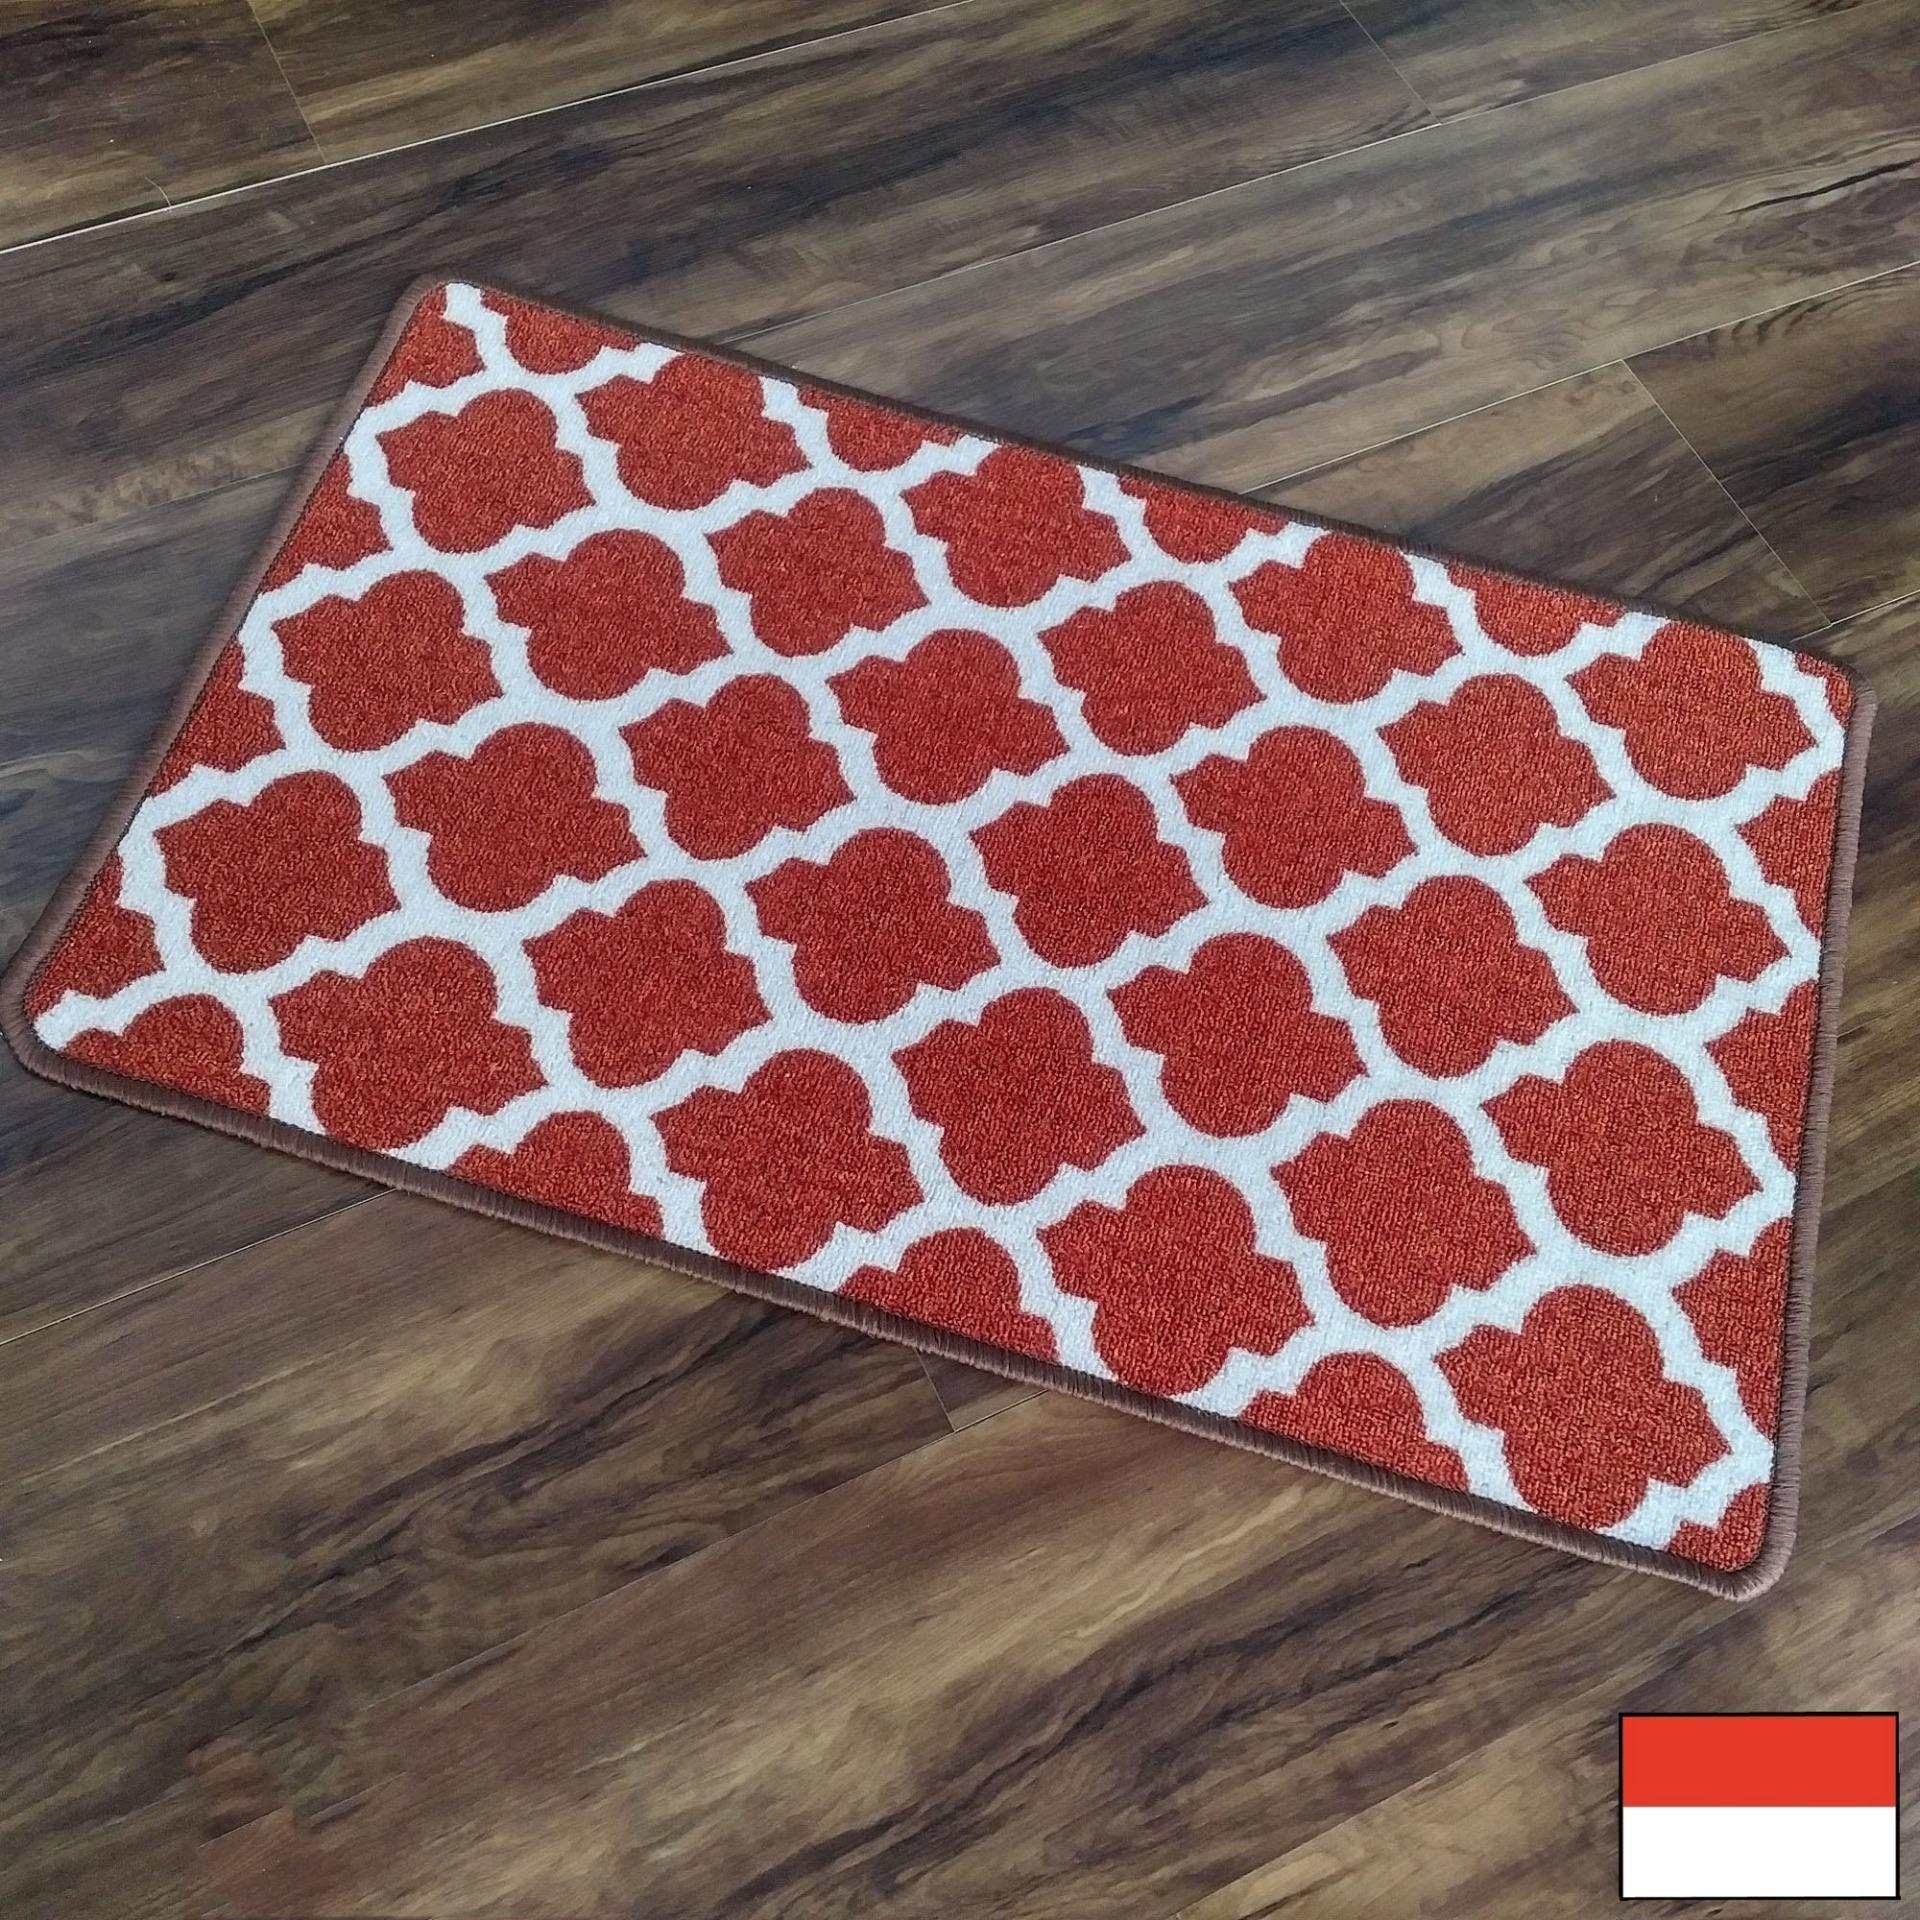 Tren-D-rugs - Keset Kamar Tidur / Keset Dapur / Kamar Mandi dengan Gel Backing Printed 50 cm x 80 cm - New Collection Geometric -  NMs